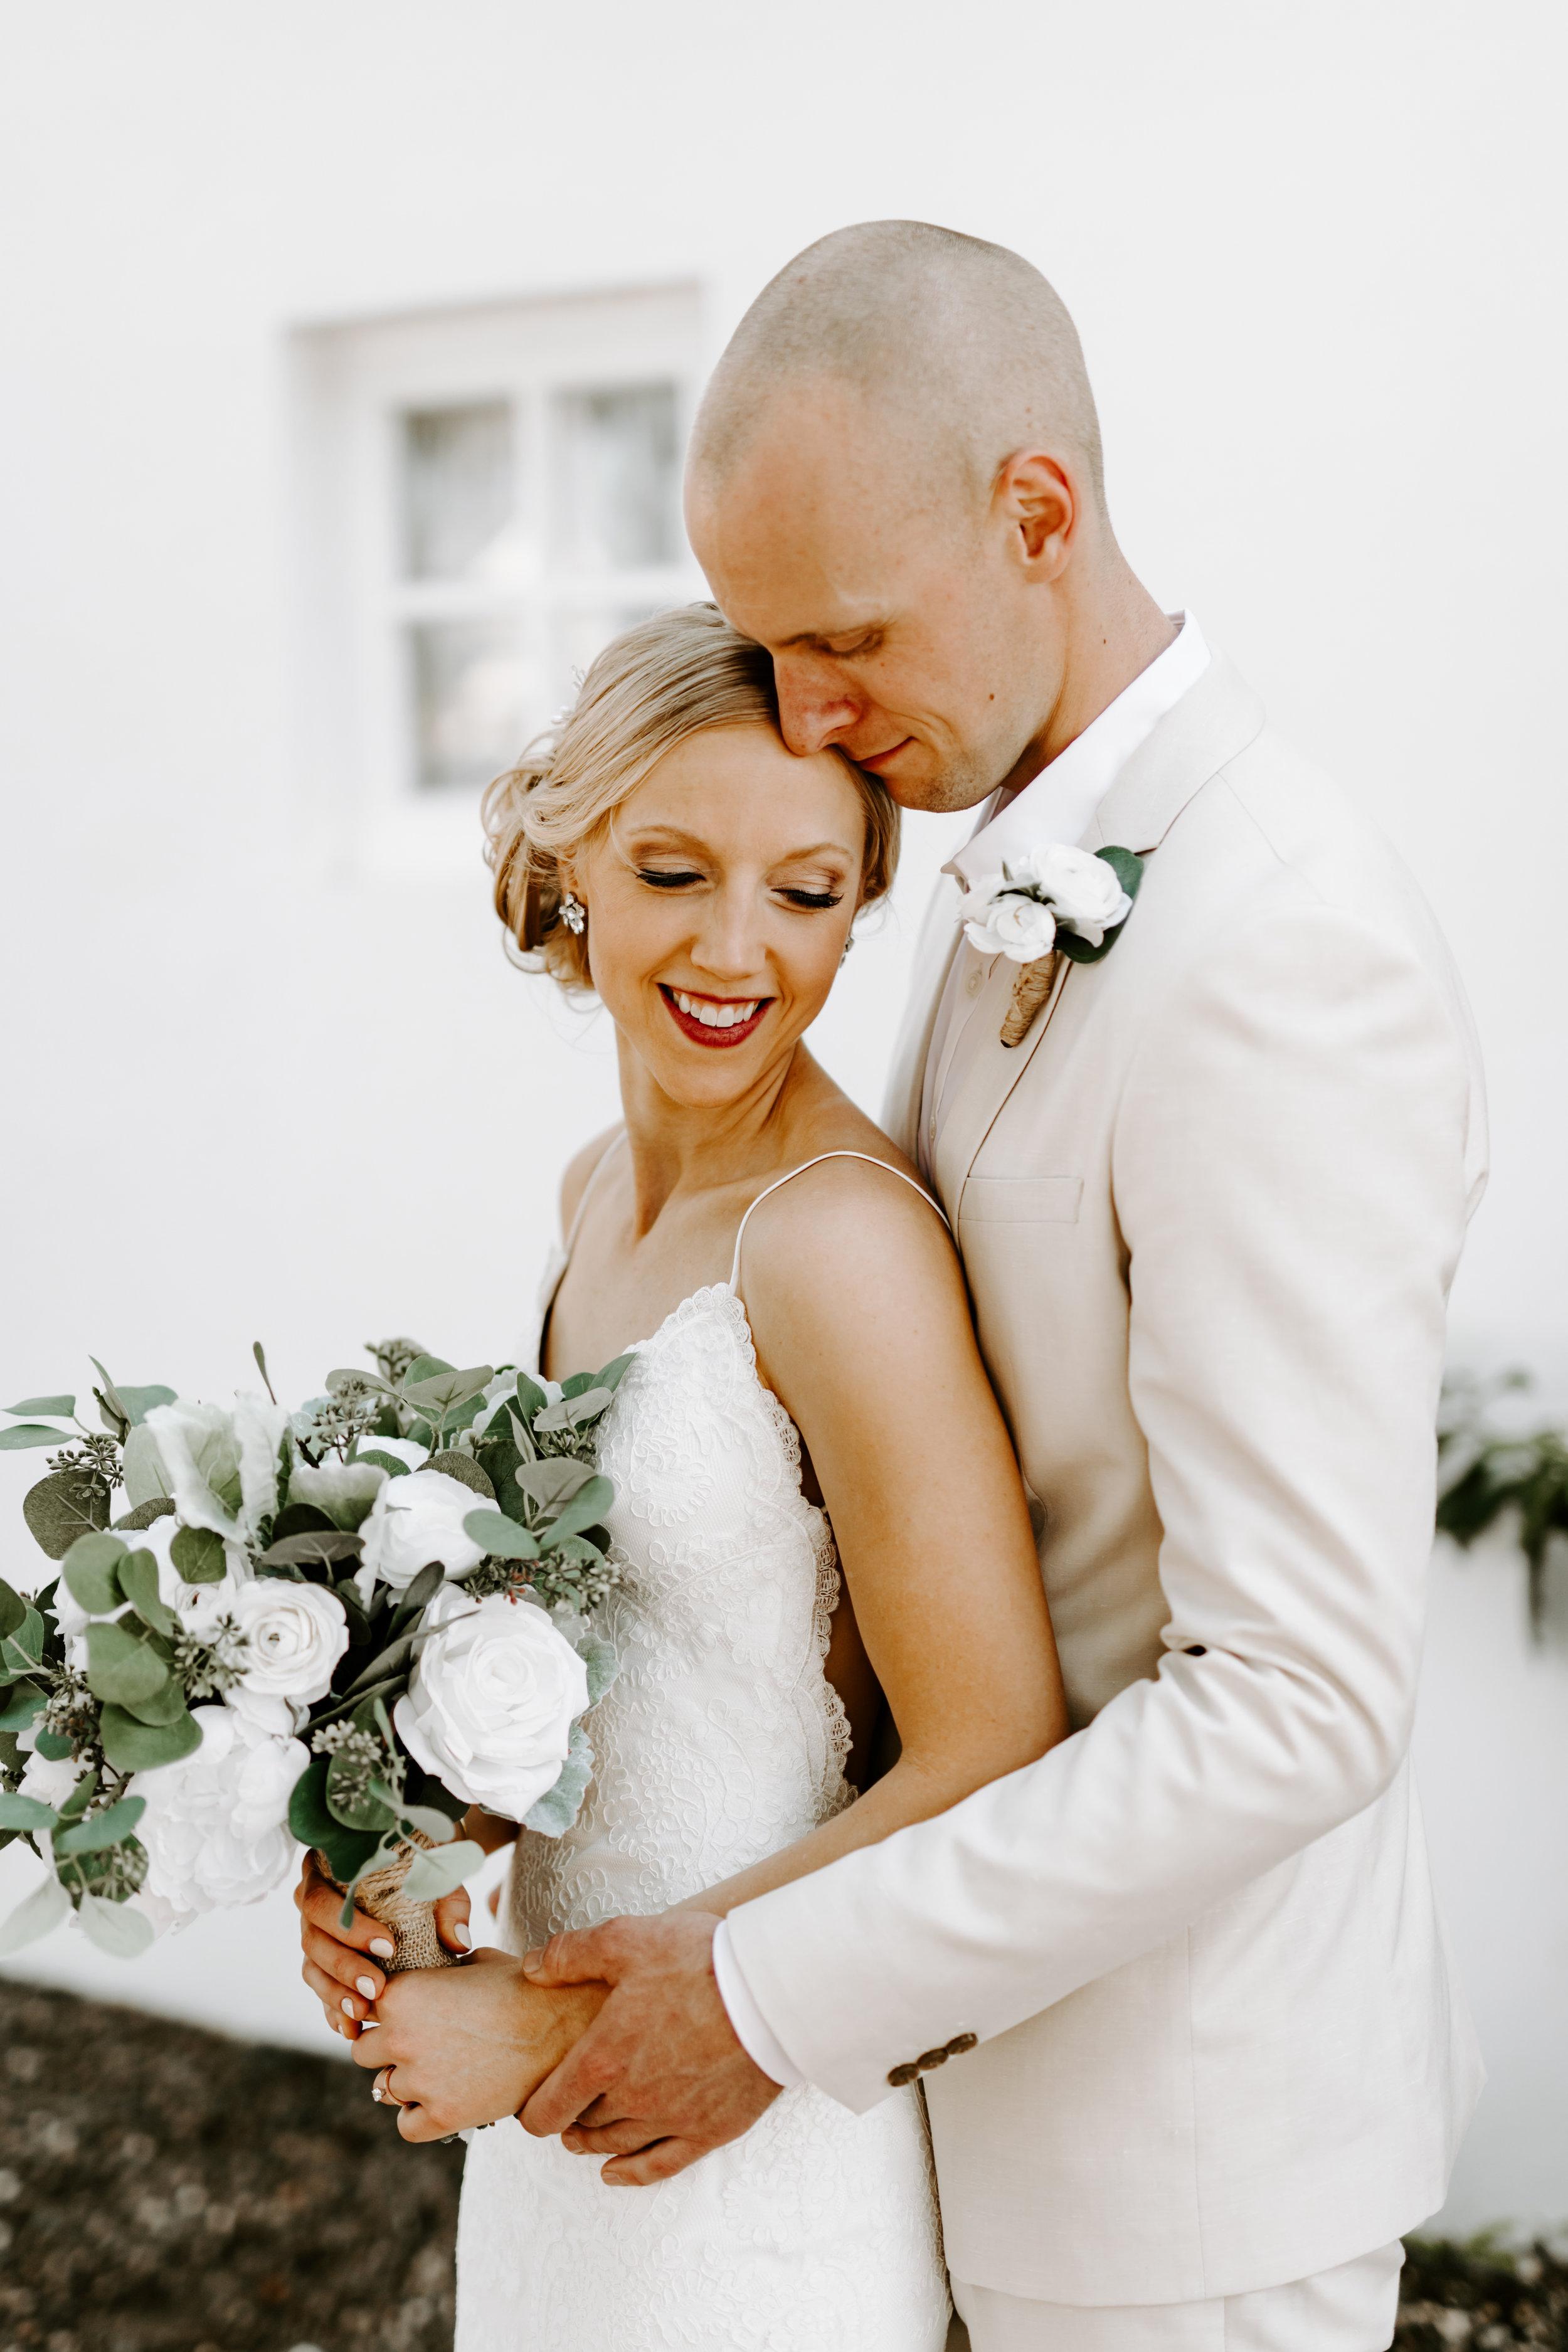 beach wedding, destination wedding, jamaica wedding, beach bride, wedding day, define fettle,